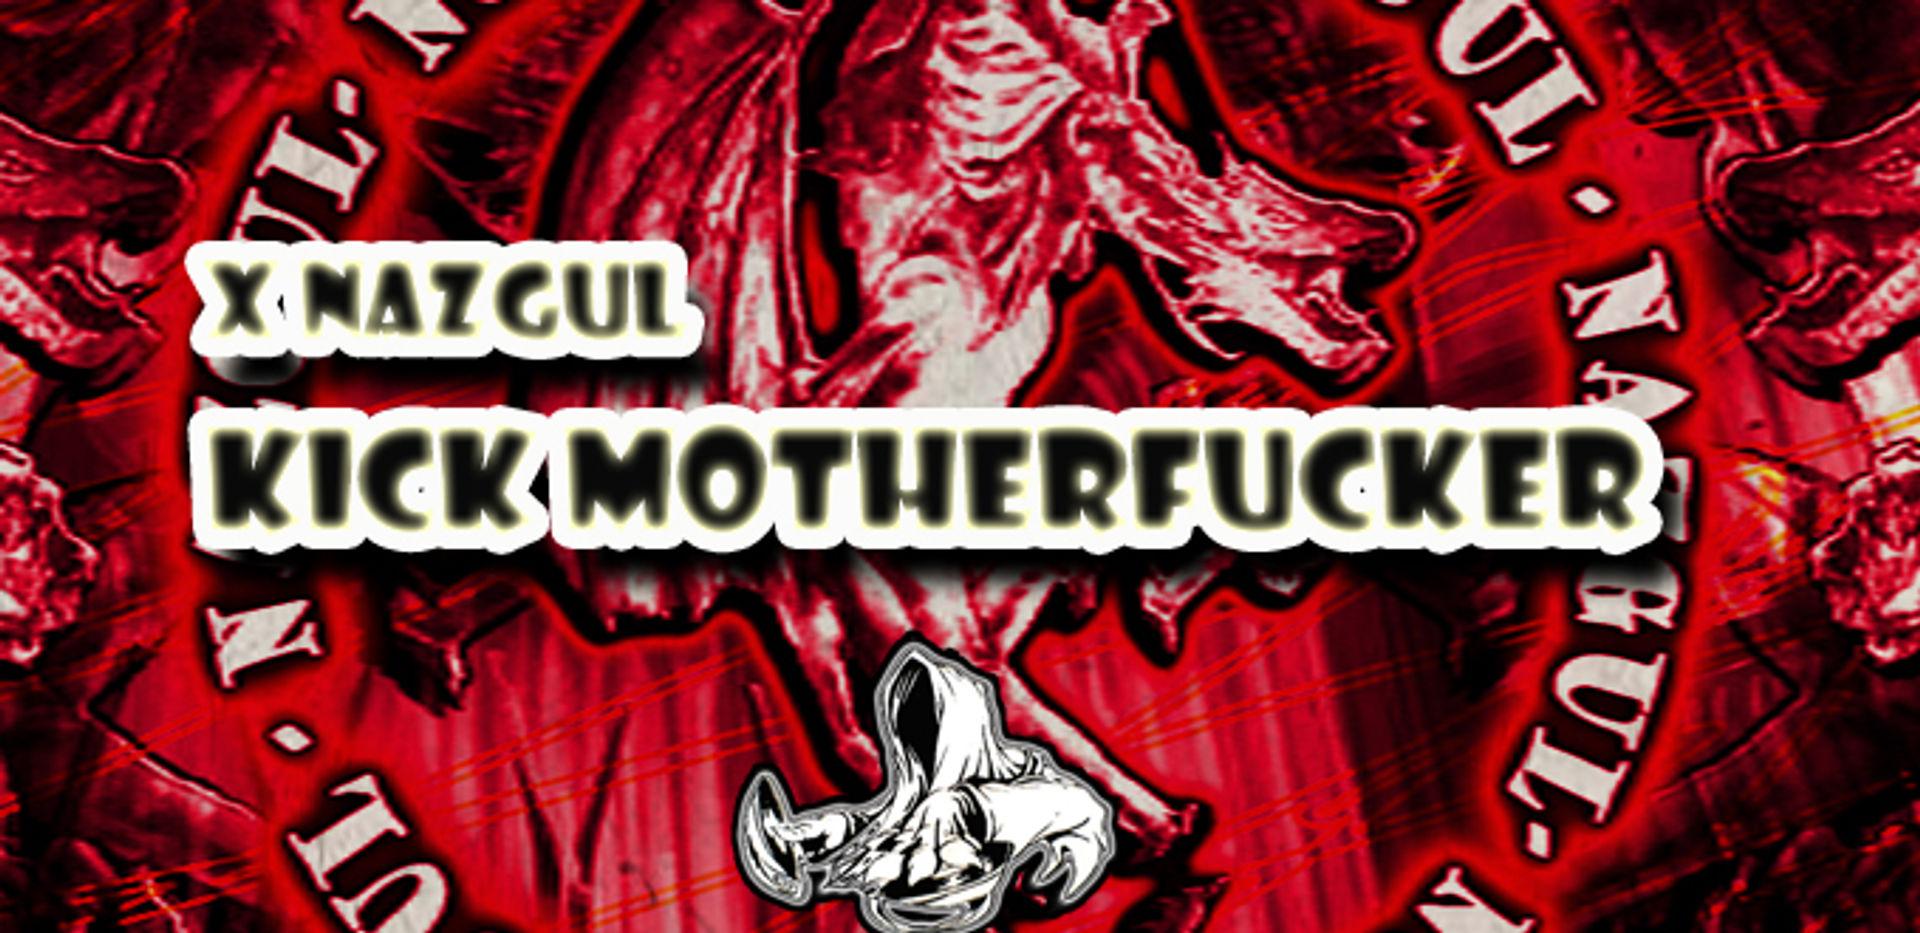 XNazgul - Kick MotherFucker